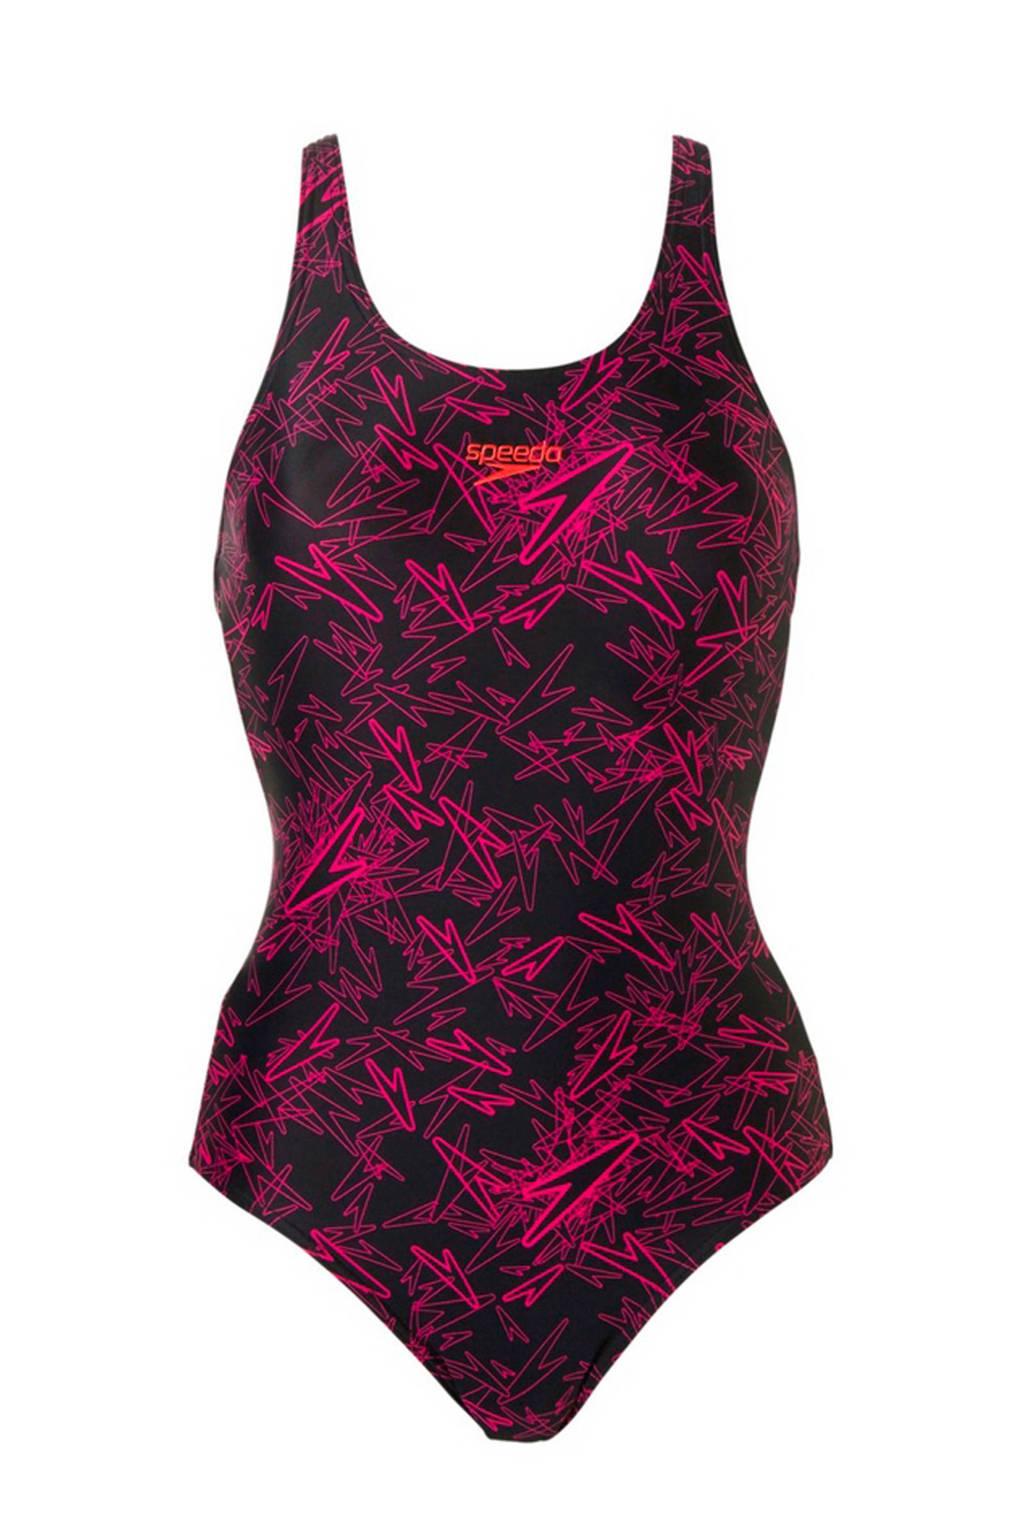 Speedo Endurance 10 sportbadpak, Zwart/roze